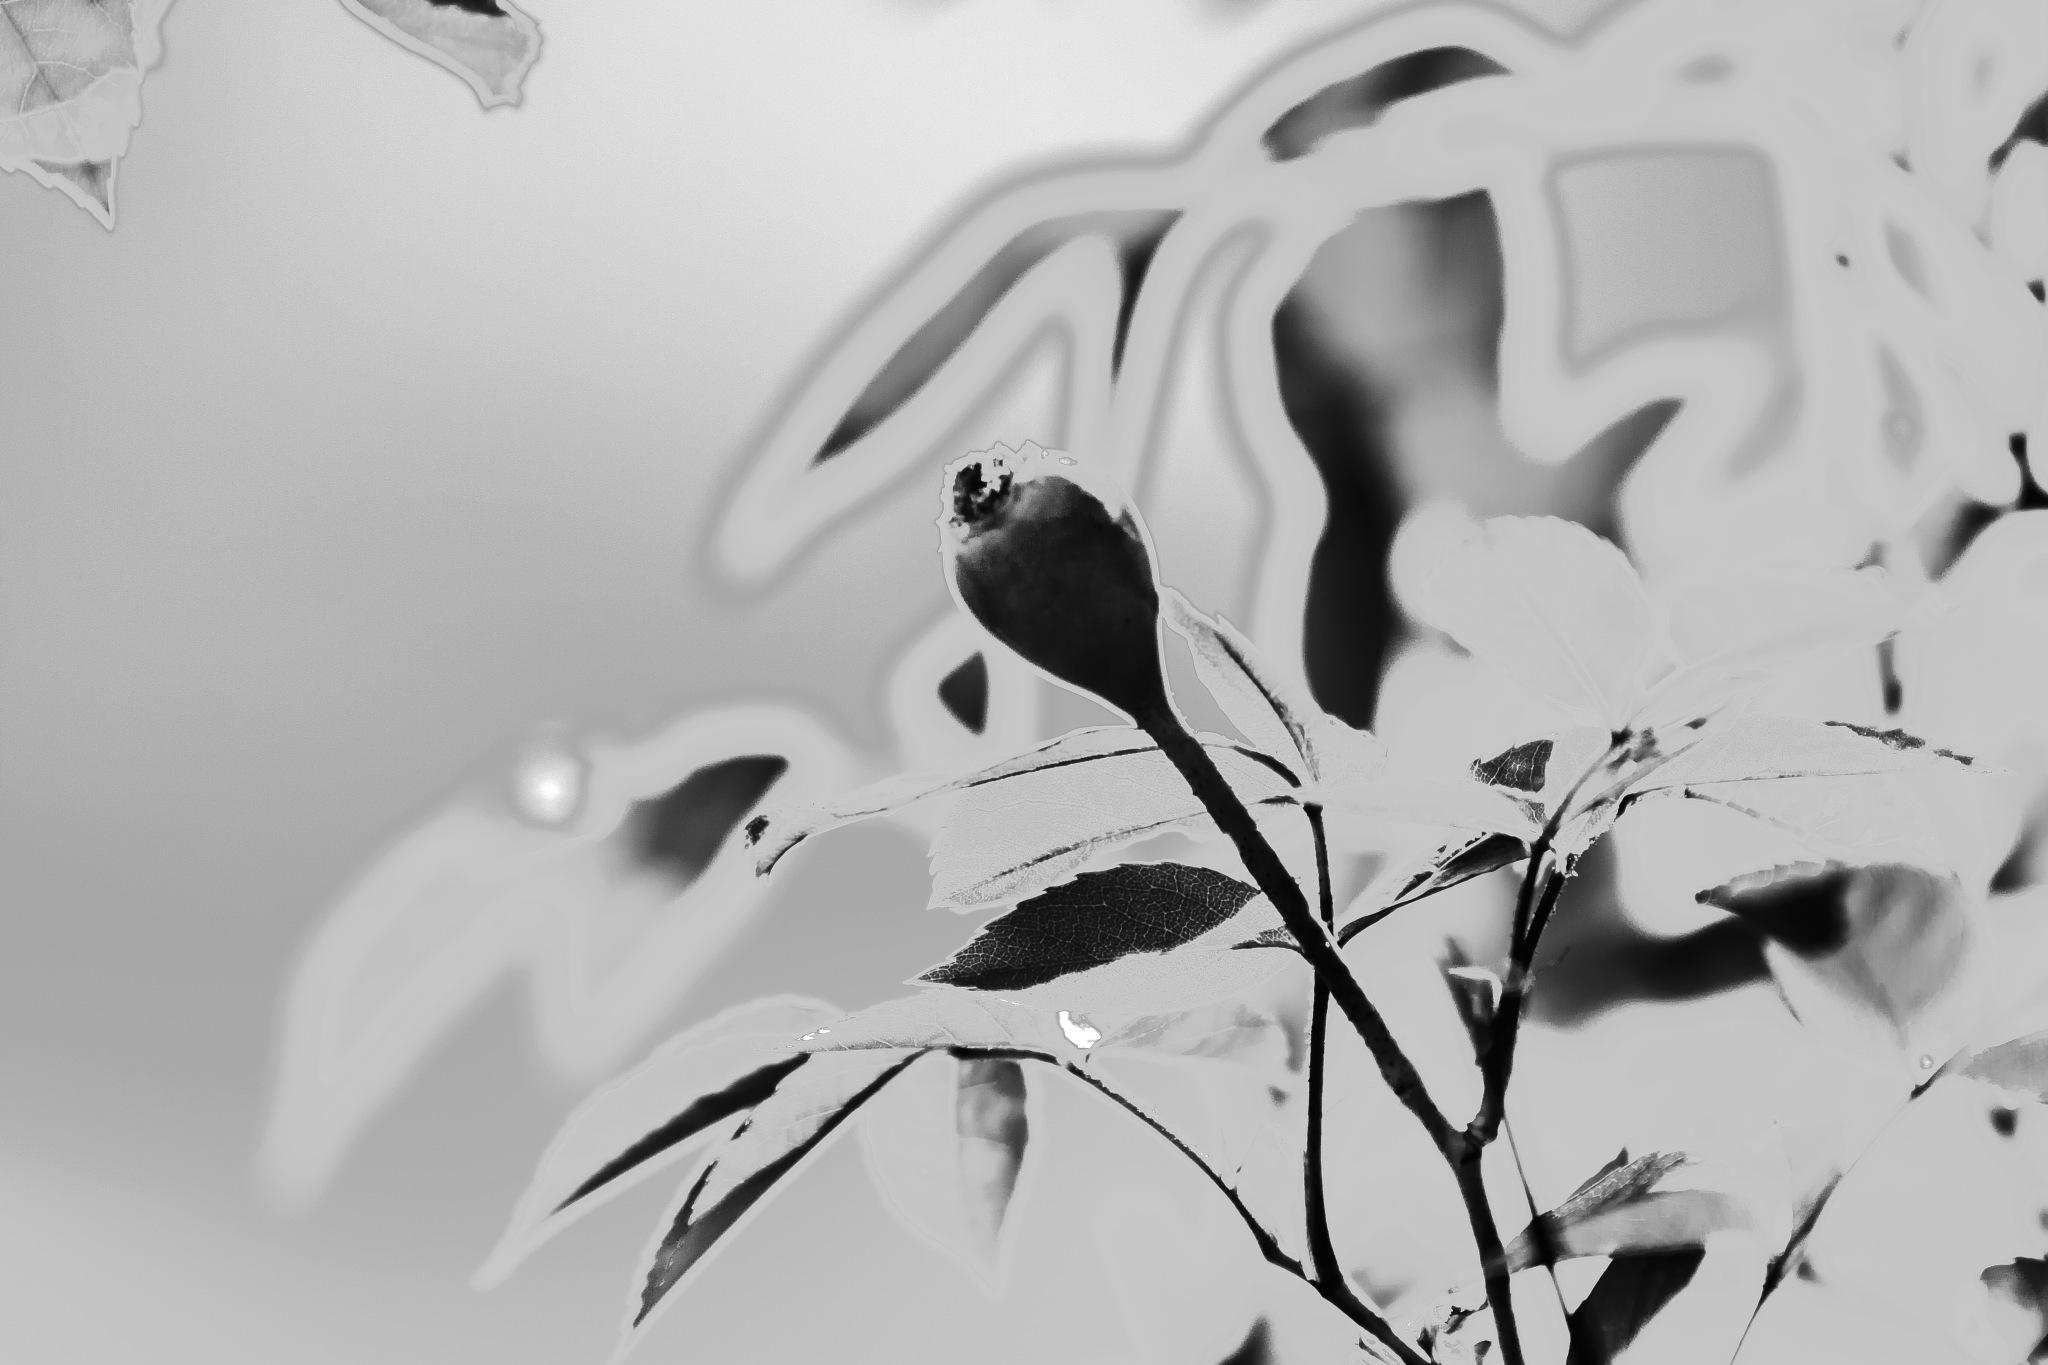 Poppy by Martyn